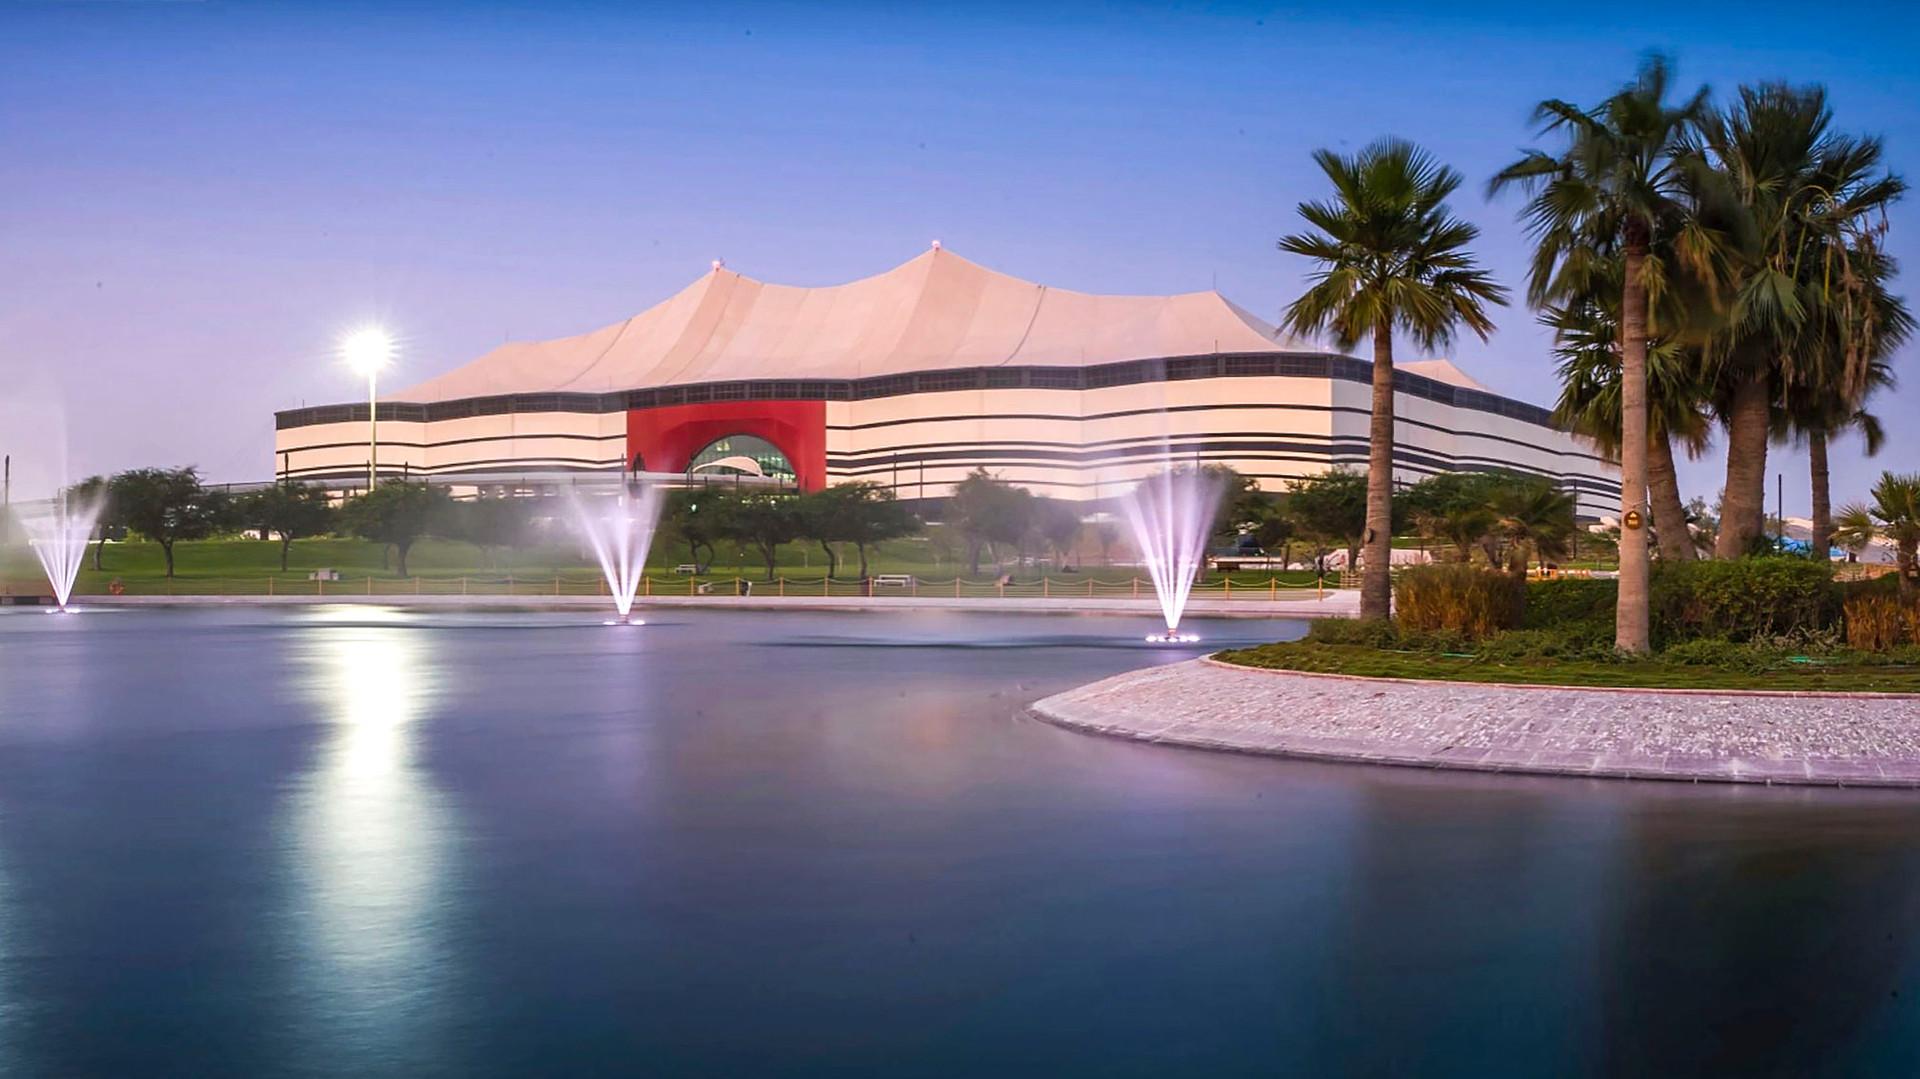 Al-bayt-stadium-fountain-design.jpg